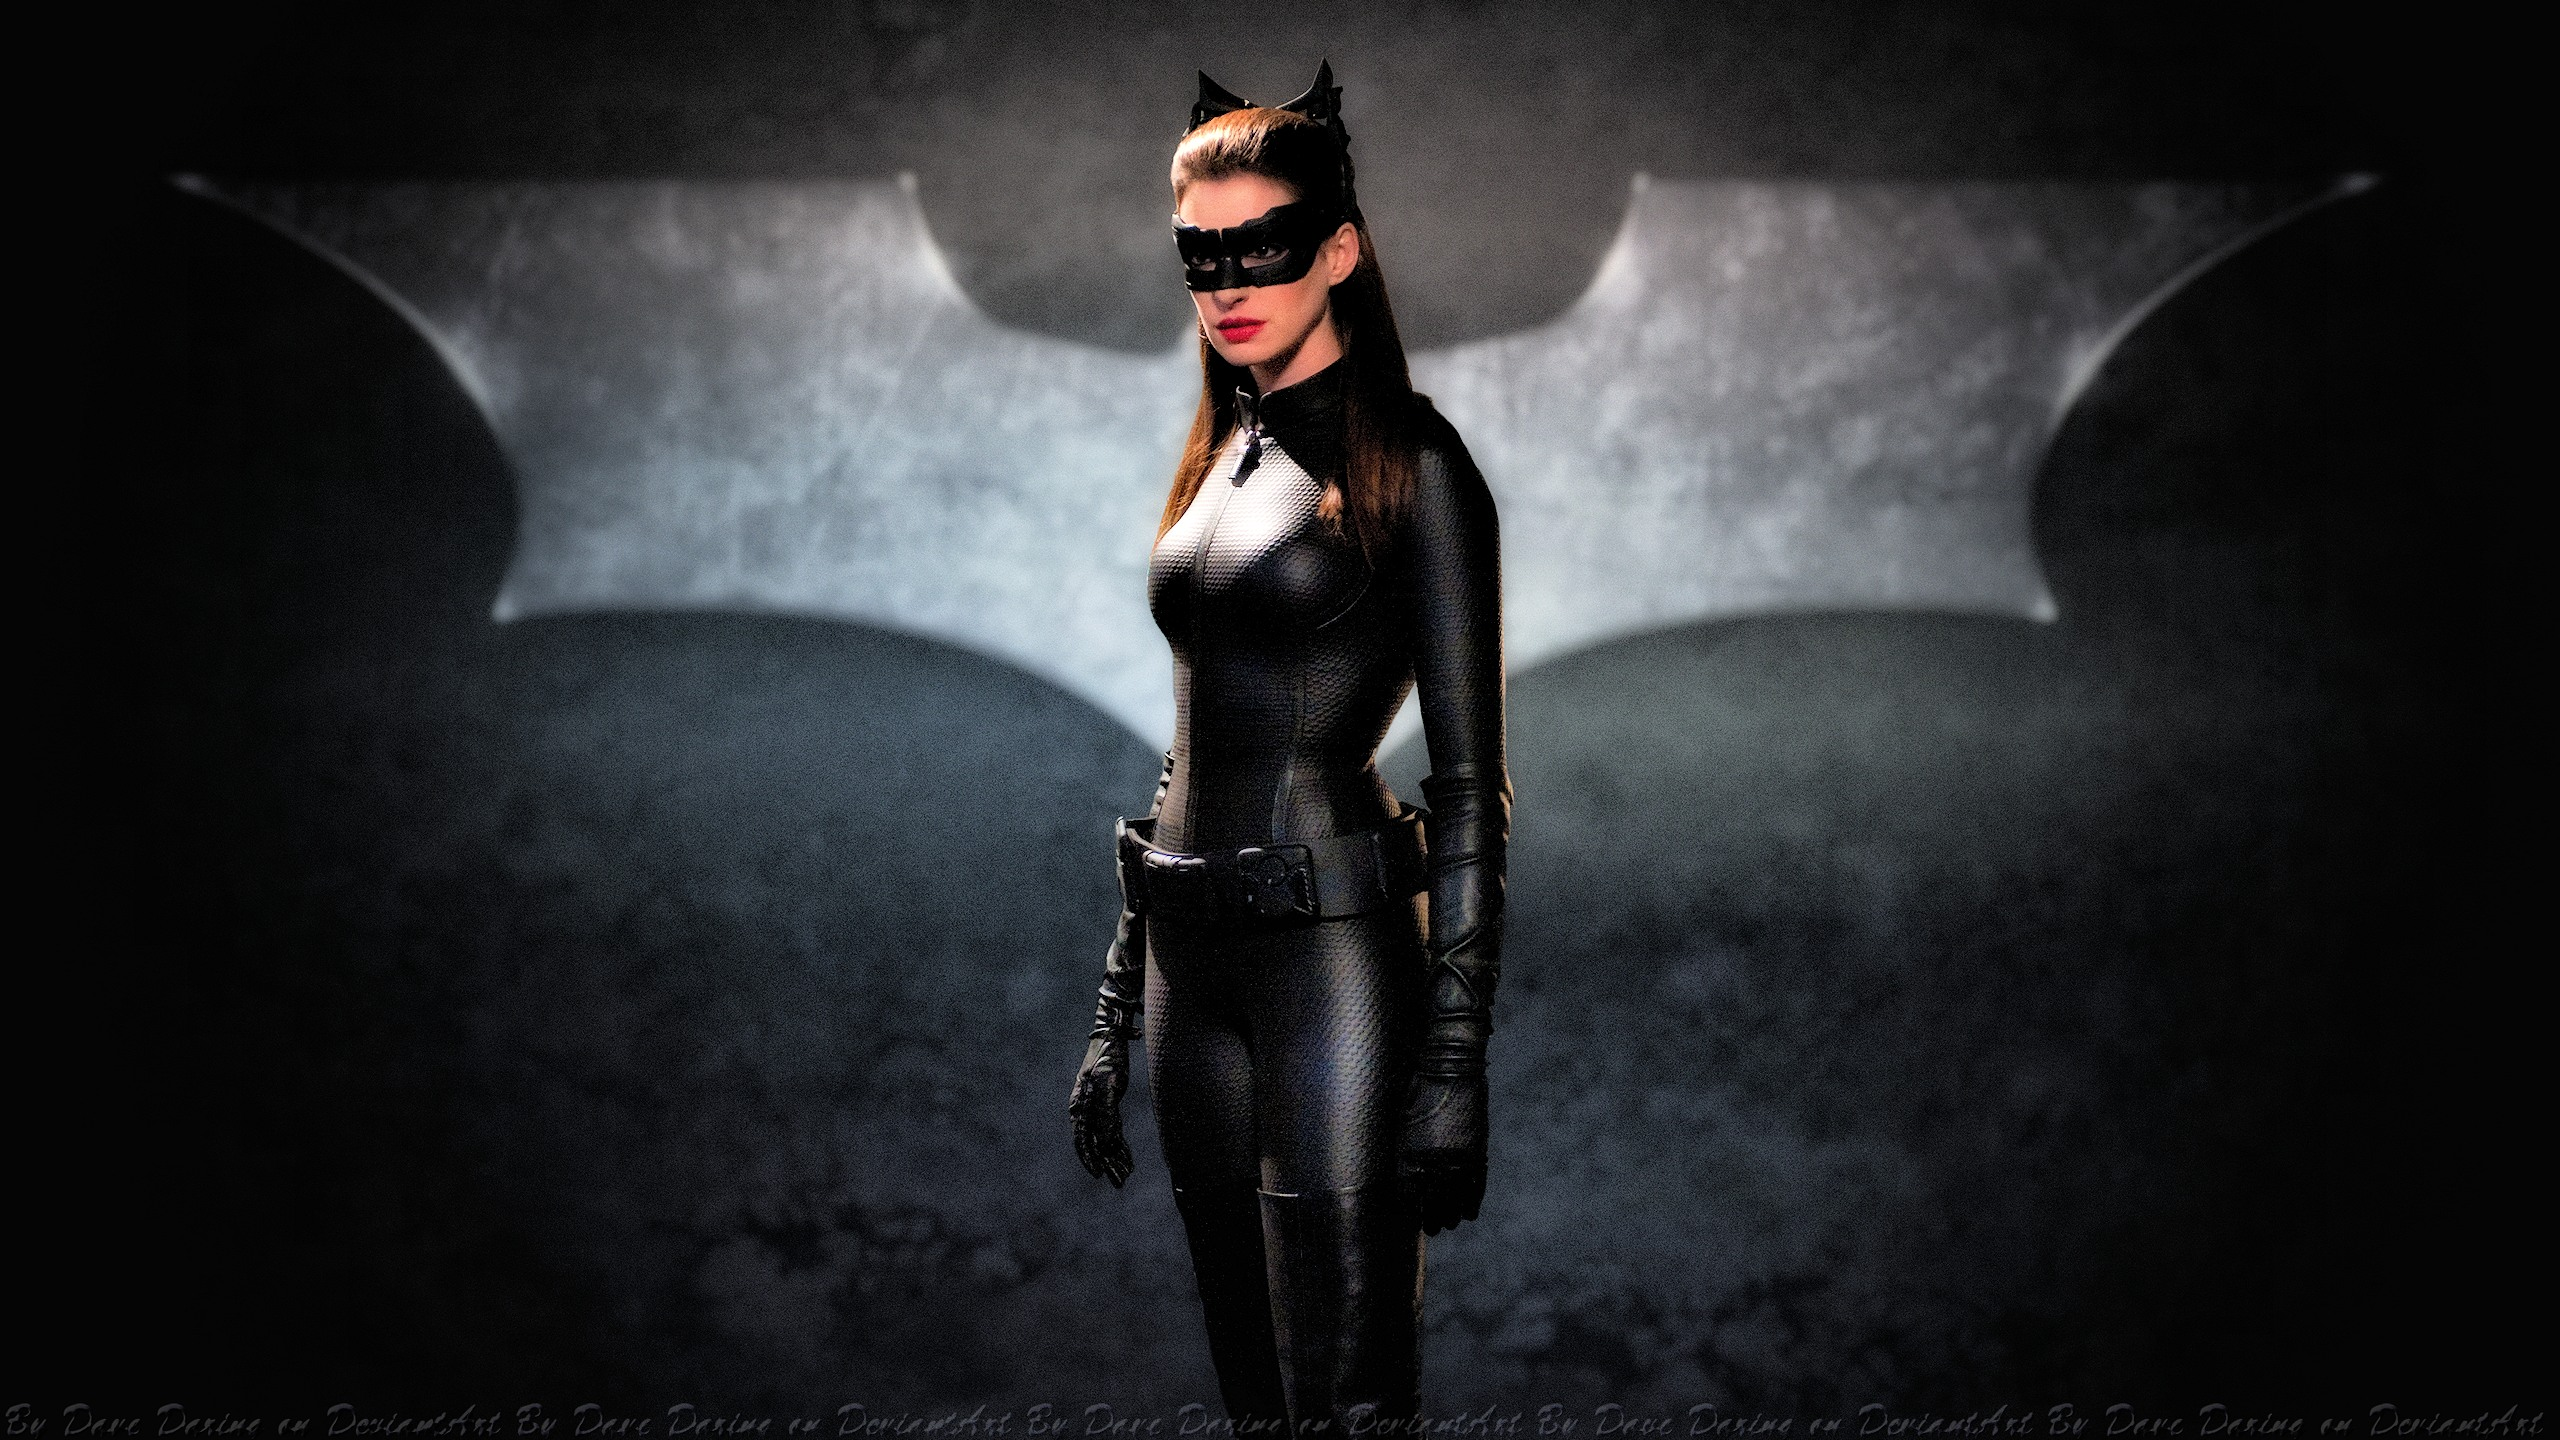 Anne Hathaway Catwoman II by DaveDaring on DeviantArt